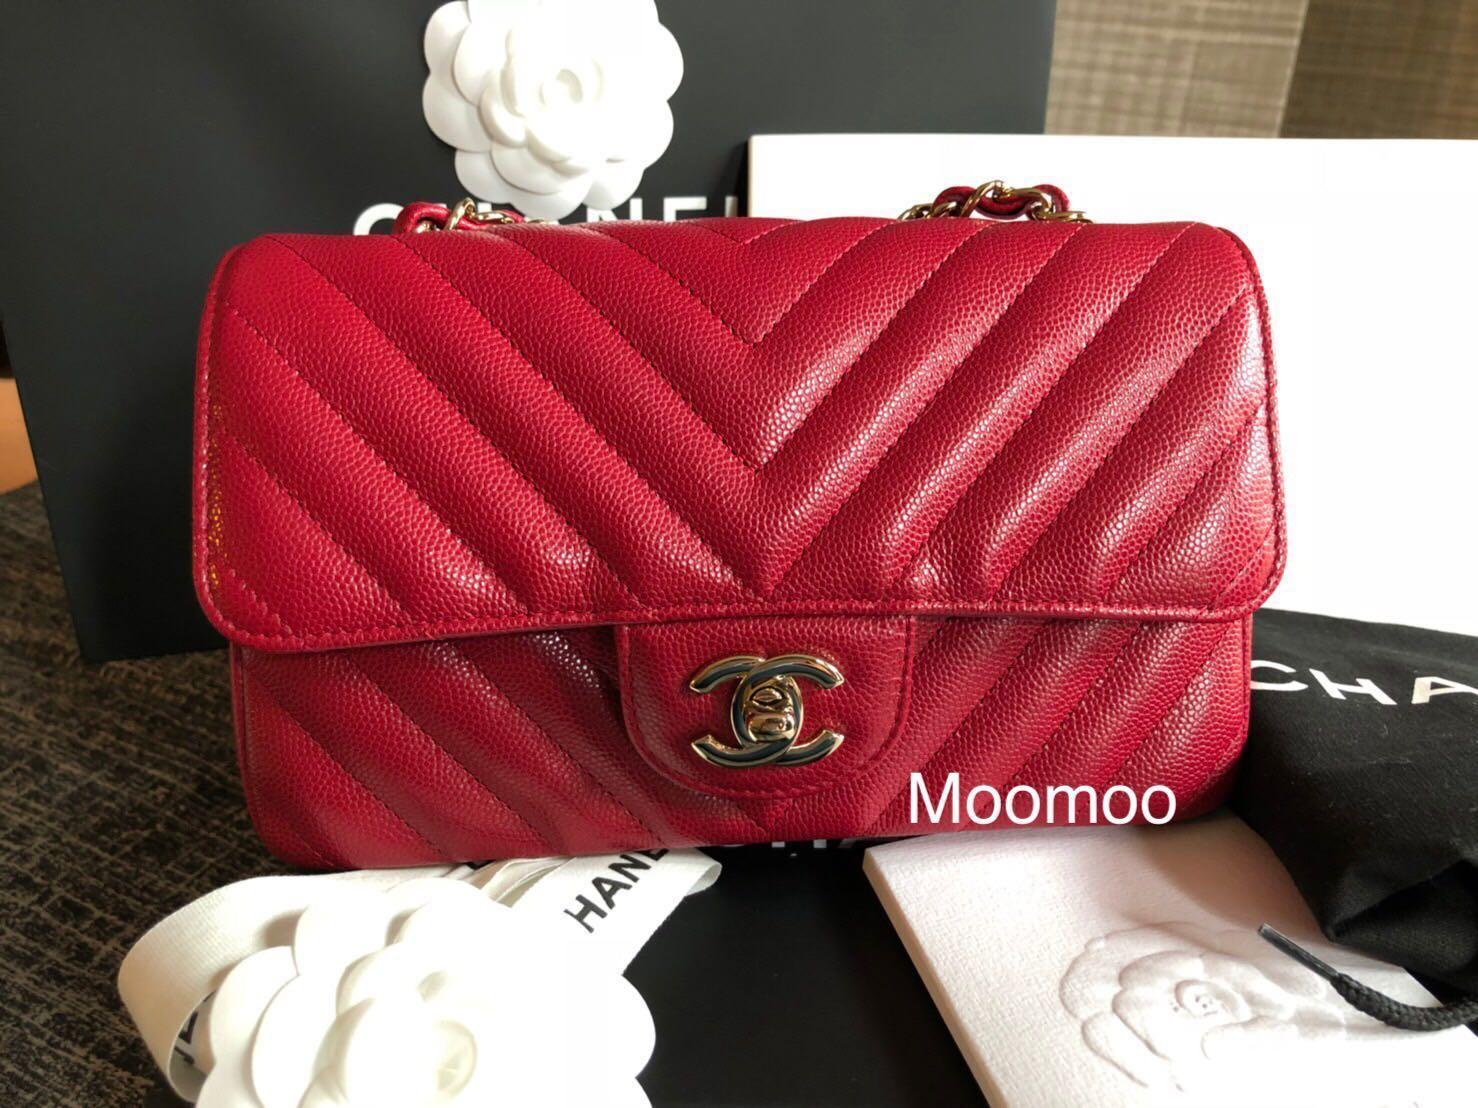 40f4de9ee6e1 BNIB Chanel Mini Chevron Bag in Gorgeous Raspberry Pink from 18B ...